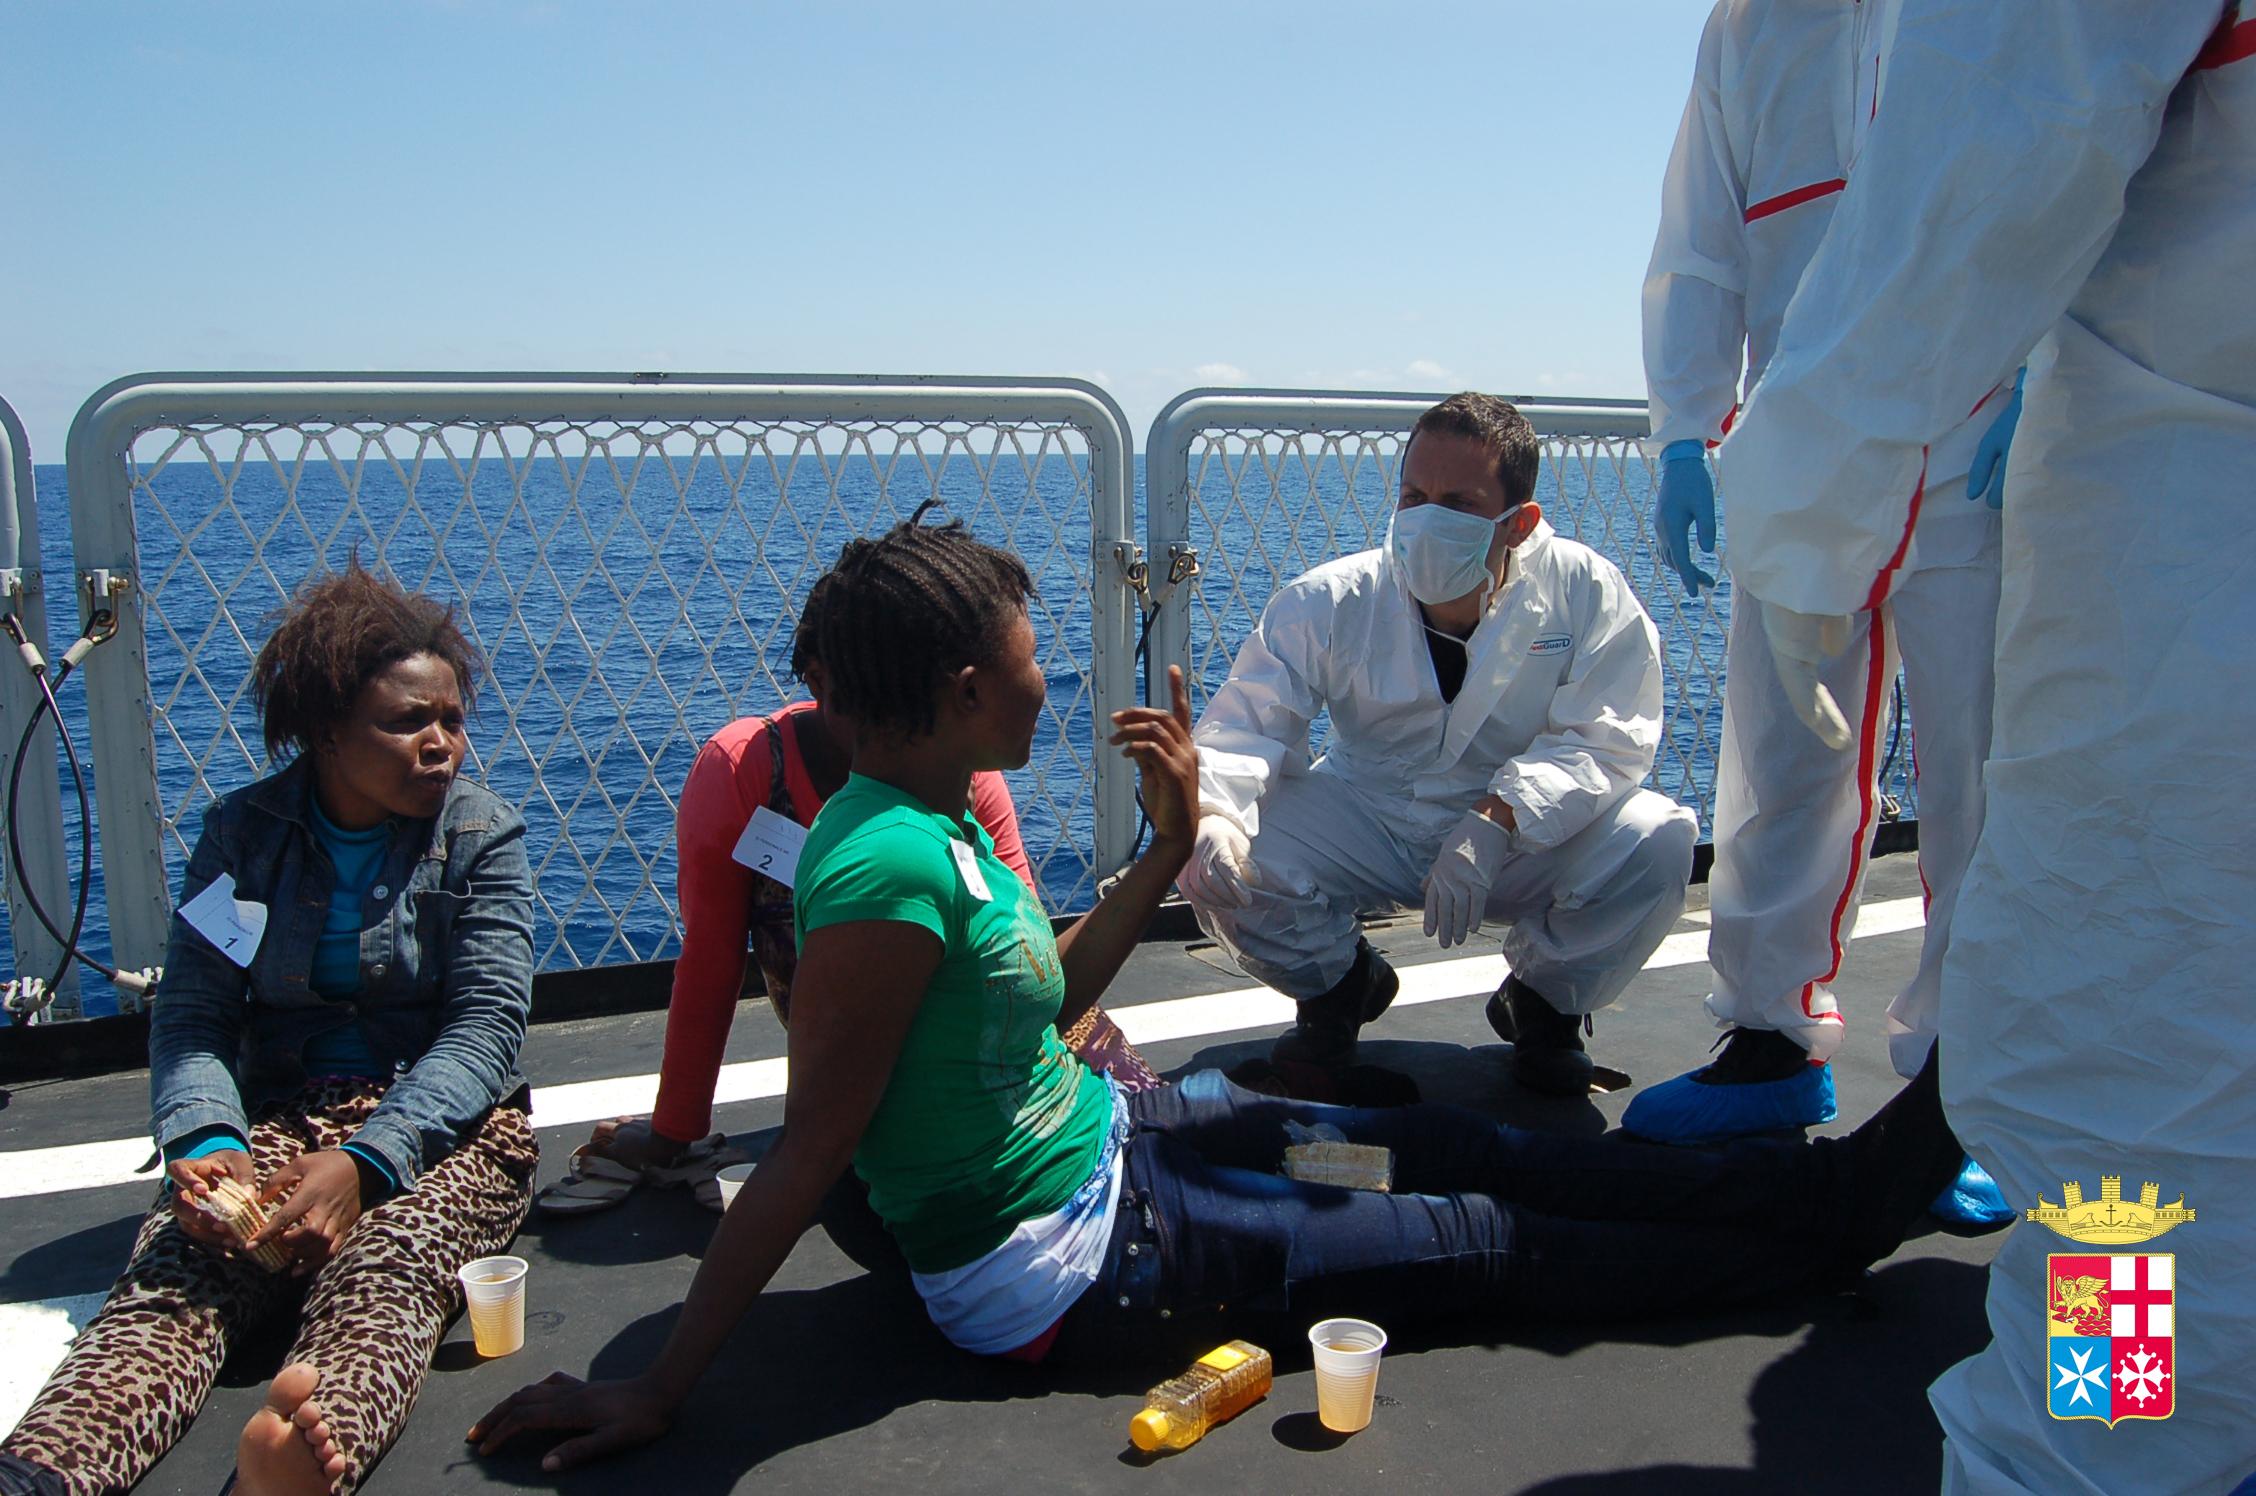 mare-nostrum-marina-lampedusa-migranti-barconi2